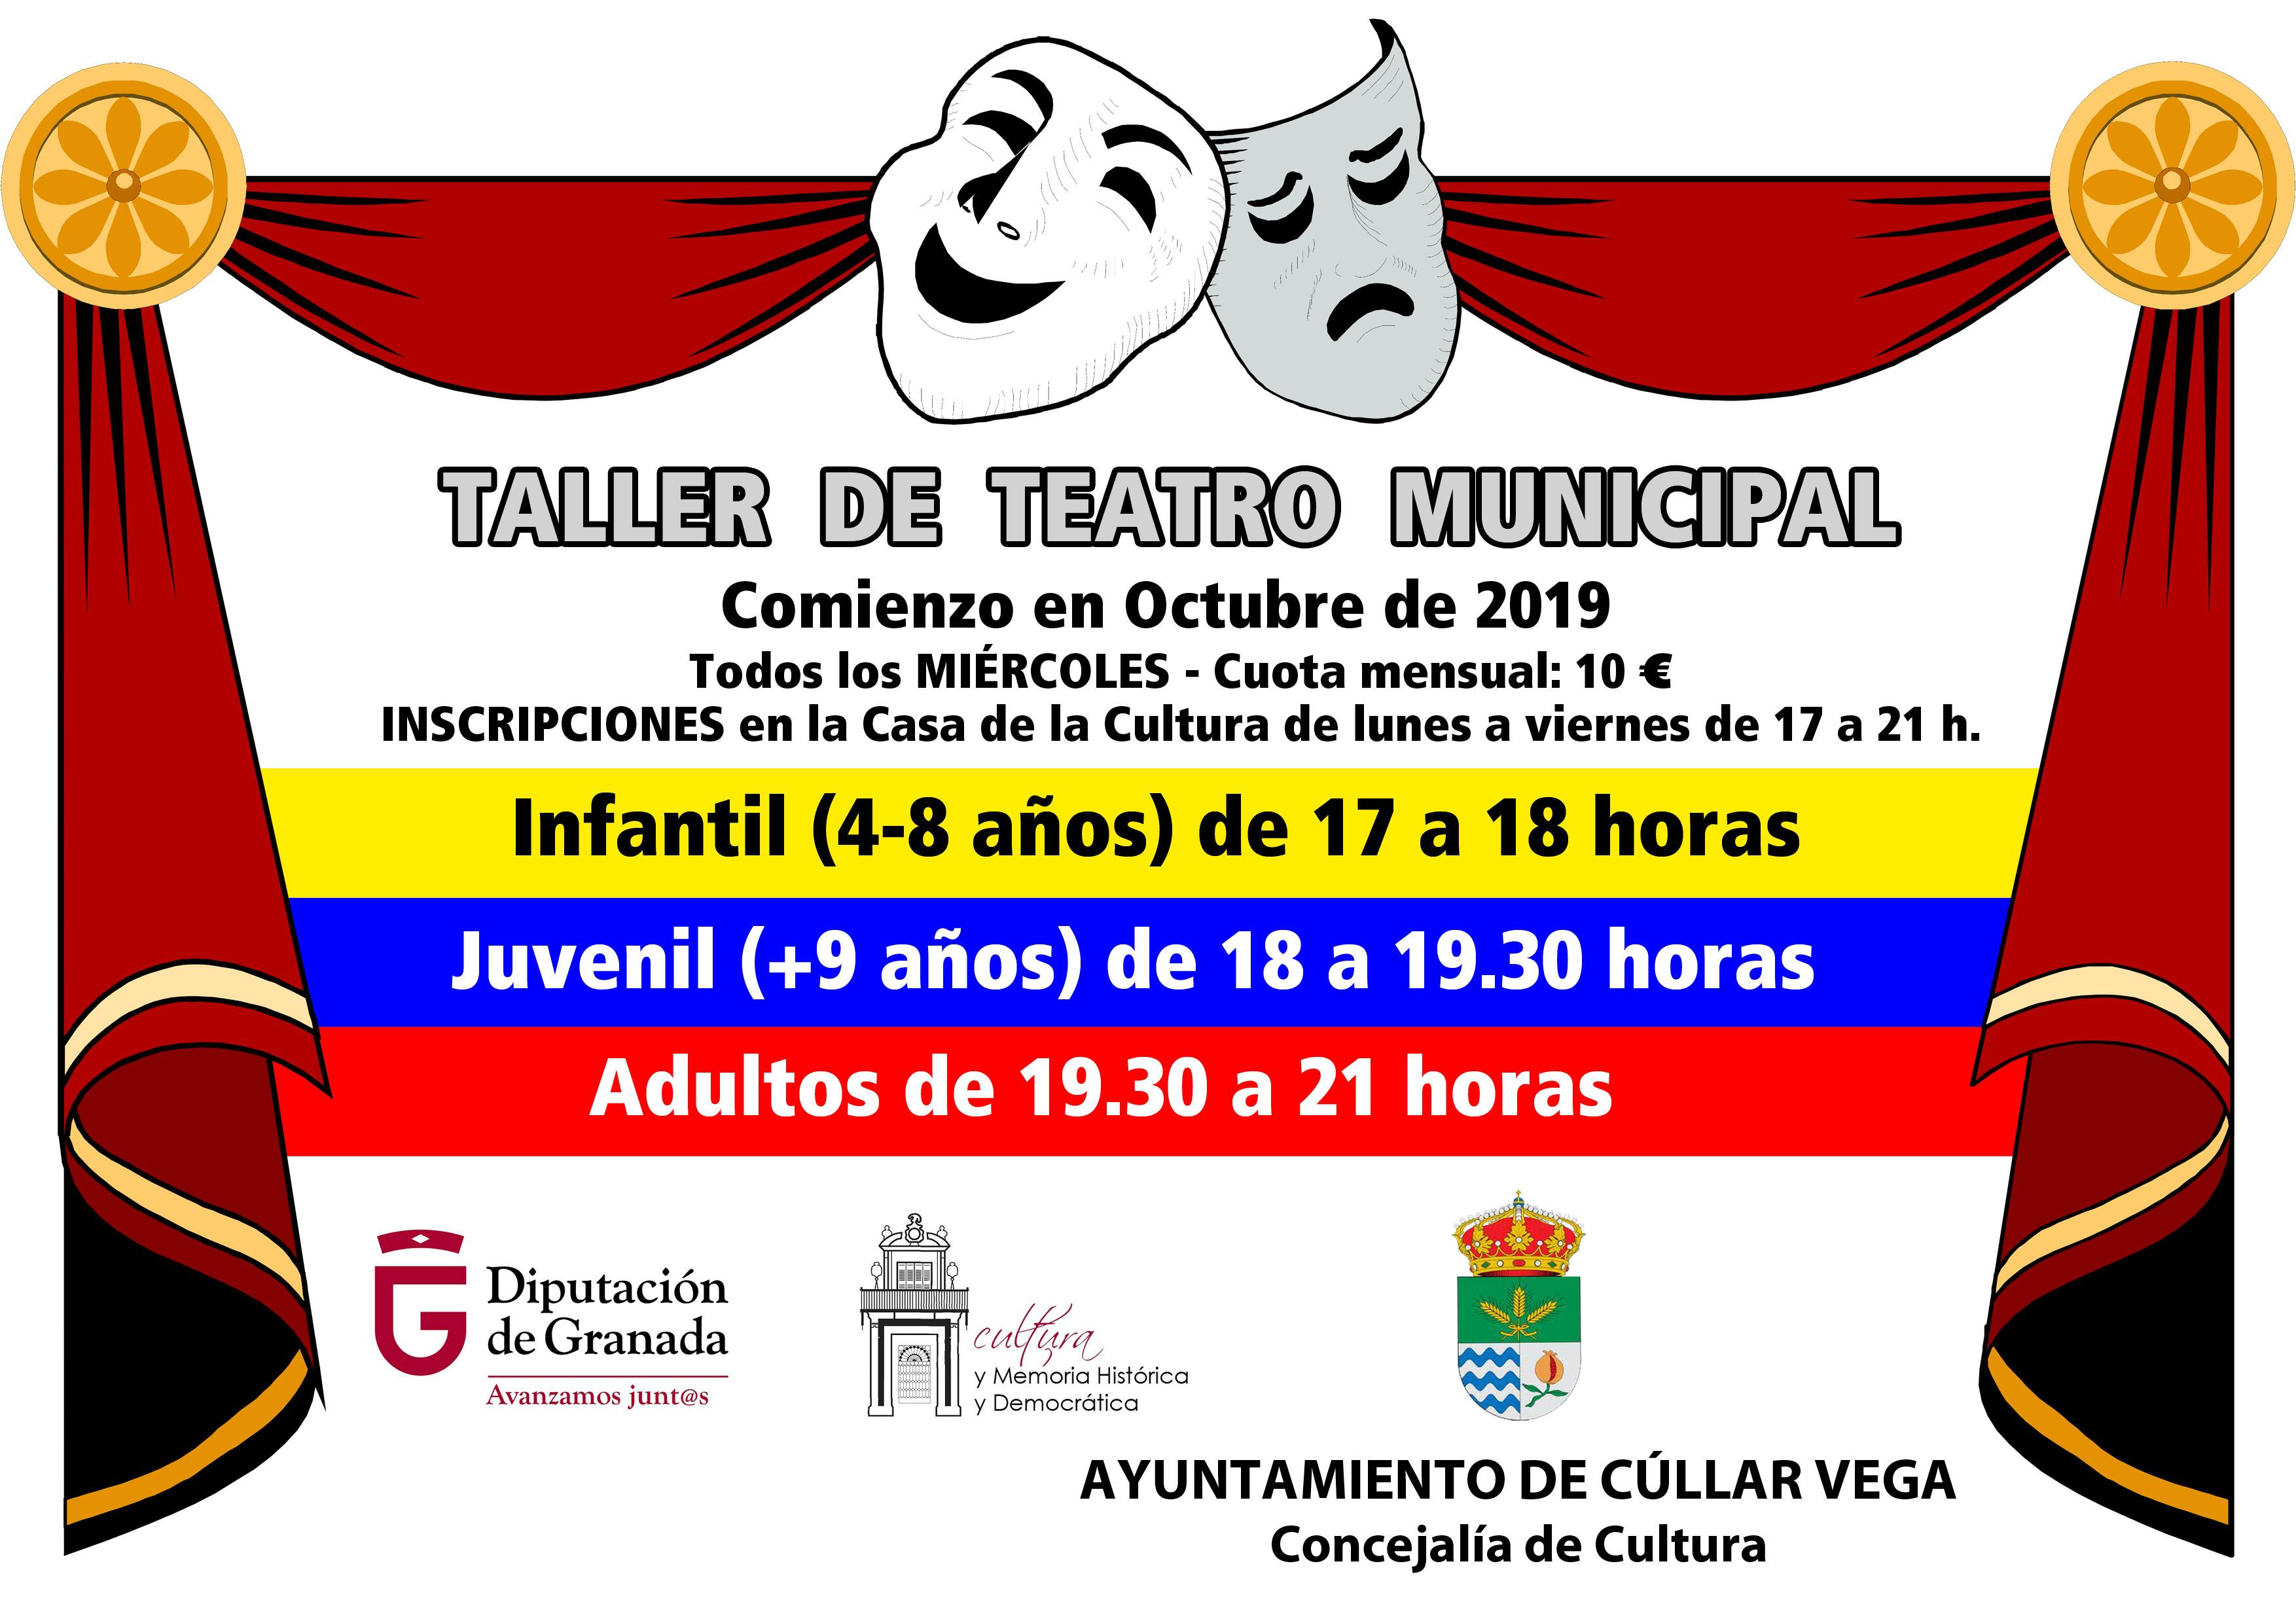 Taller de Teatro Municipal 2019-2020